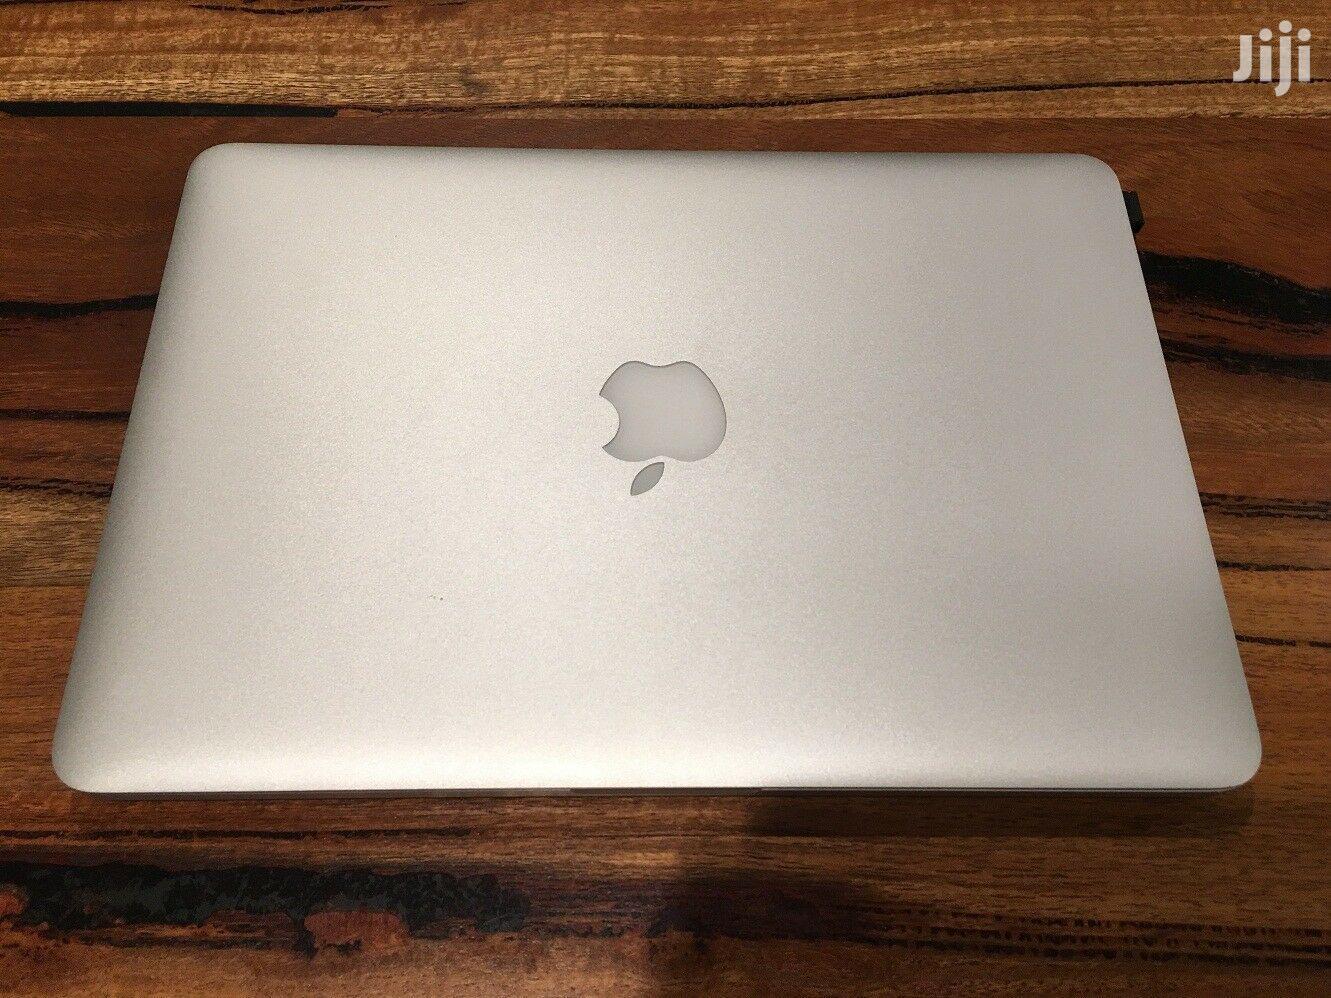 New Laptop Apple MacBook Pro 8GB Intel Core i5 SSD 128GB | Laptops & Computers for sale in Kampala, Central Region, Uganda